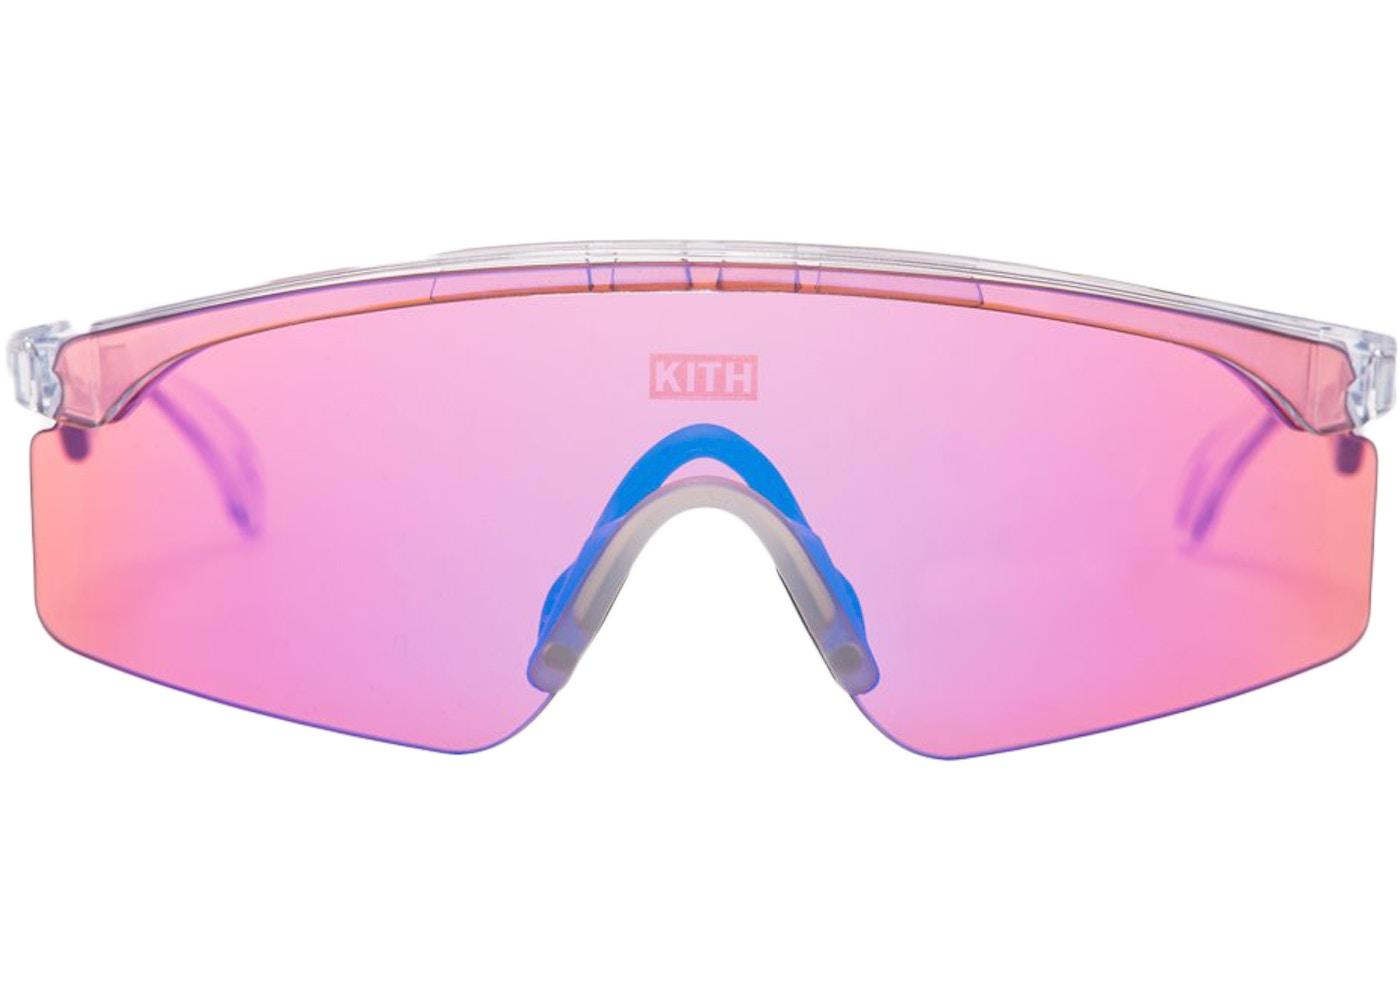 75a94eb6b5727 Kith x Oakley Razorblade Sunglasses Pink. x Oakley Razorblade